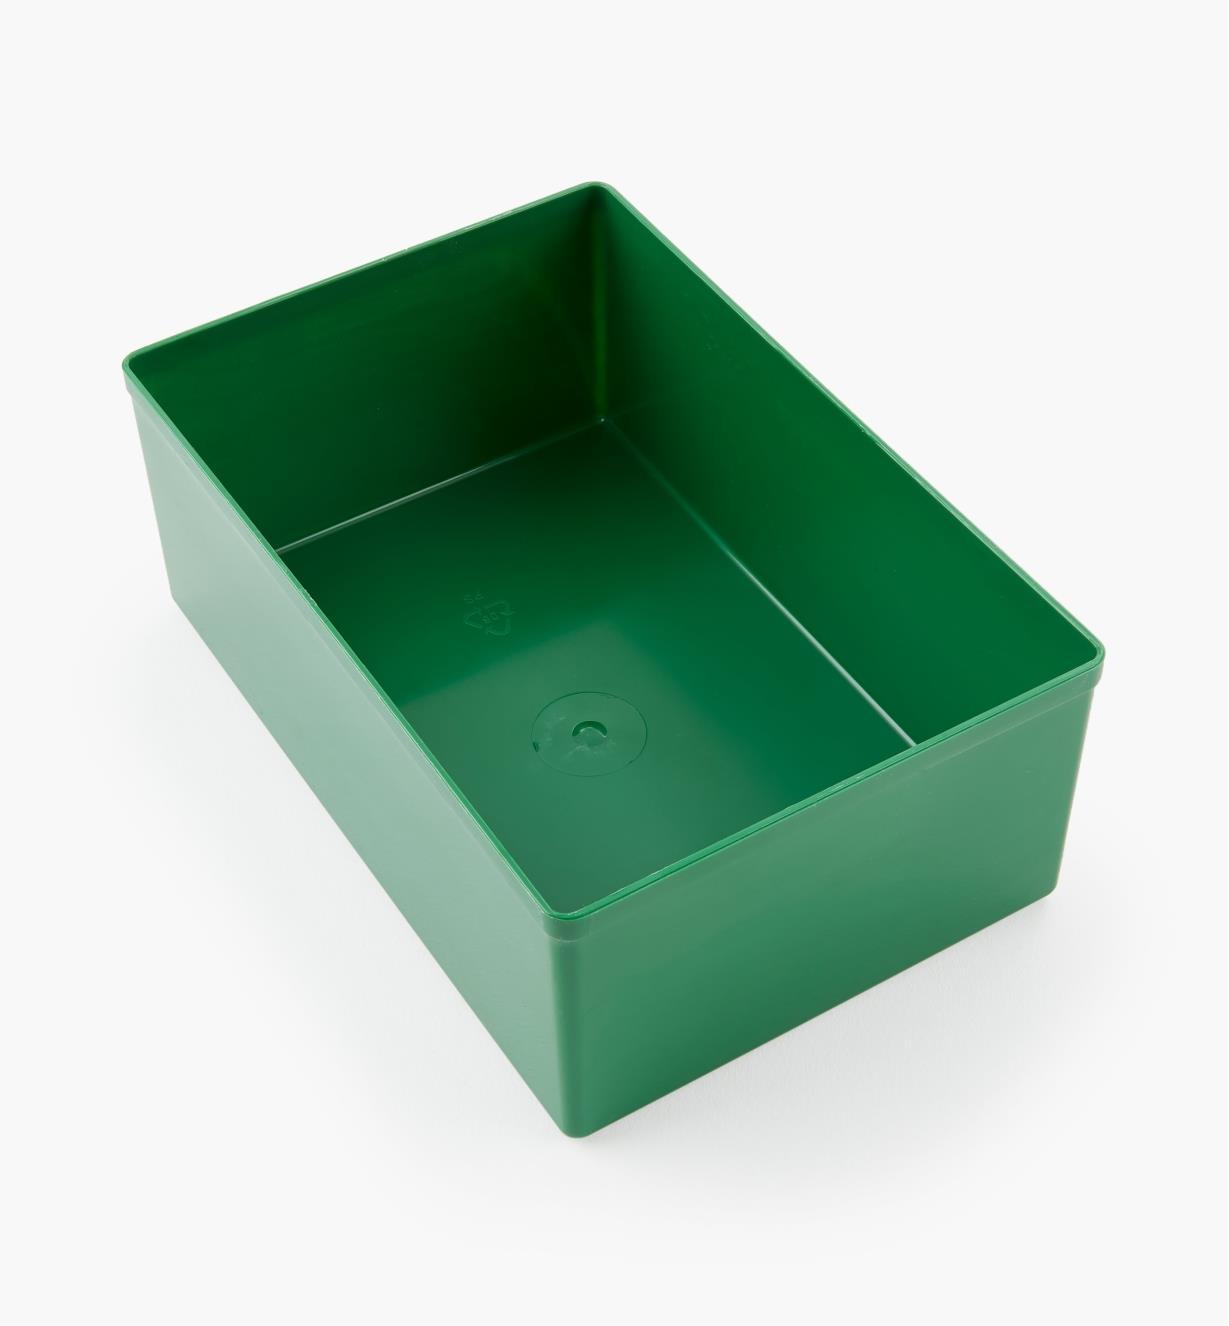 27K8024 - Godet vert de 62 mm x 159 mm x 105 mm (2 7/16 po x 6 1/4 po x 4 1/8 po), l'unité